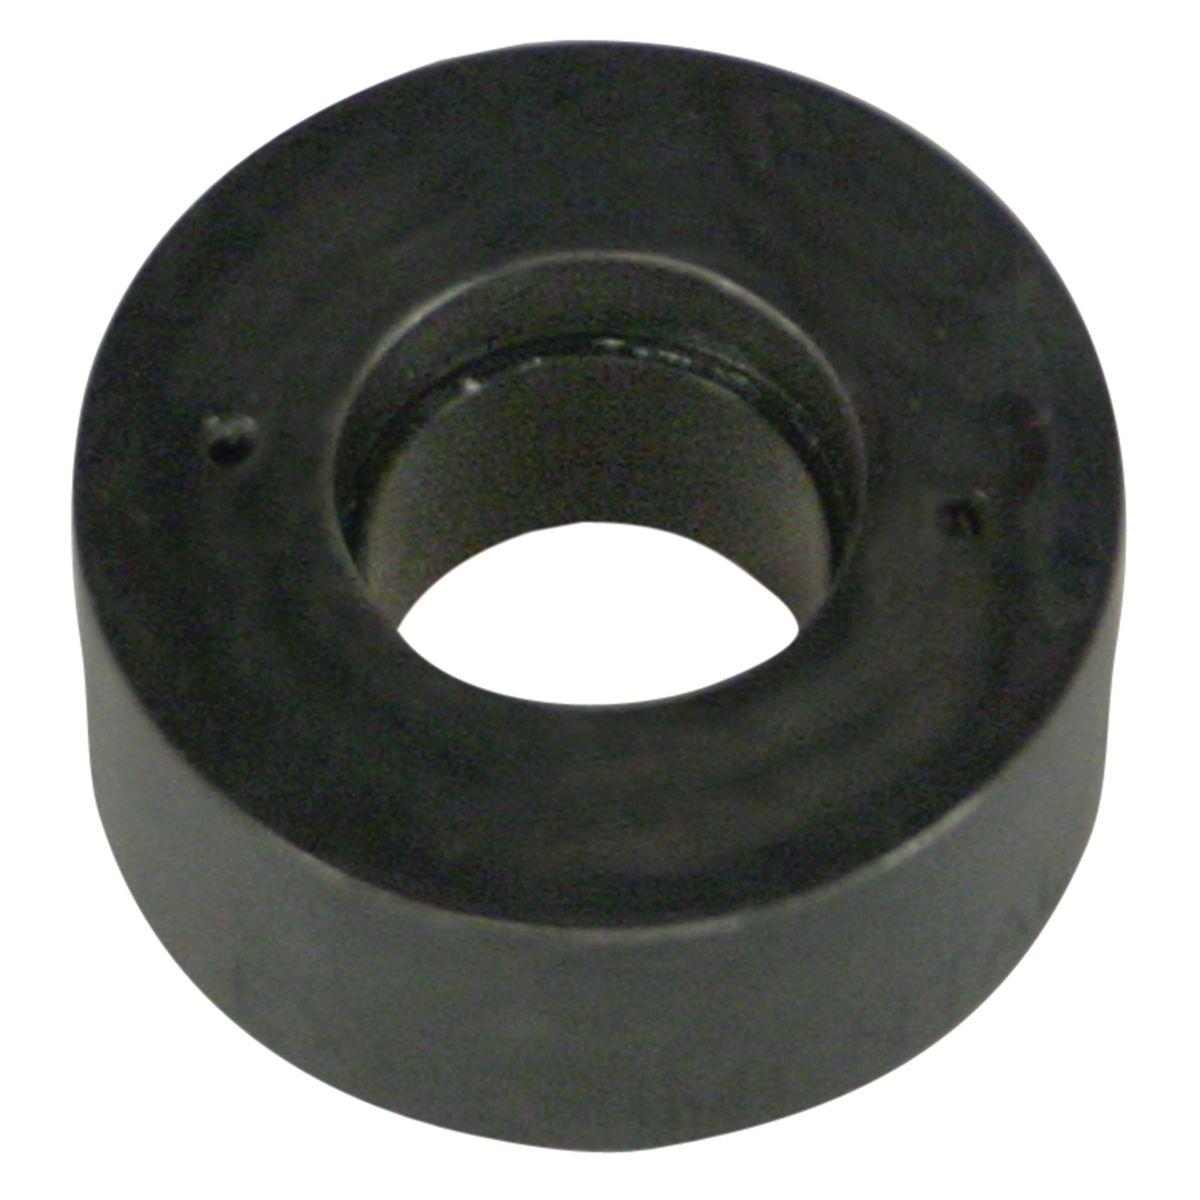 New Lisle Wheel Stud Installer Use Impact Wrench Ratchets for Car /& Light Duty